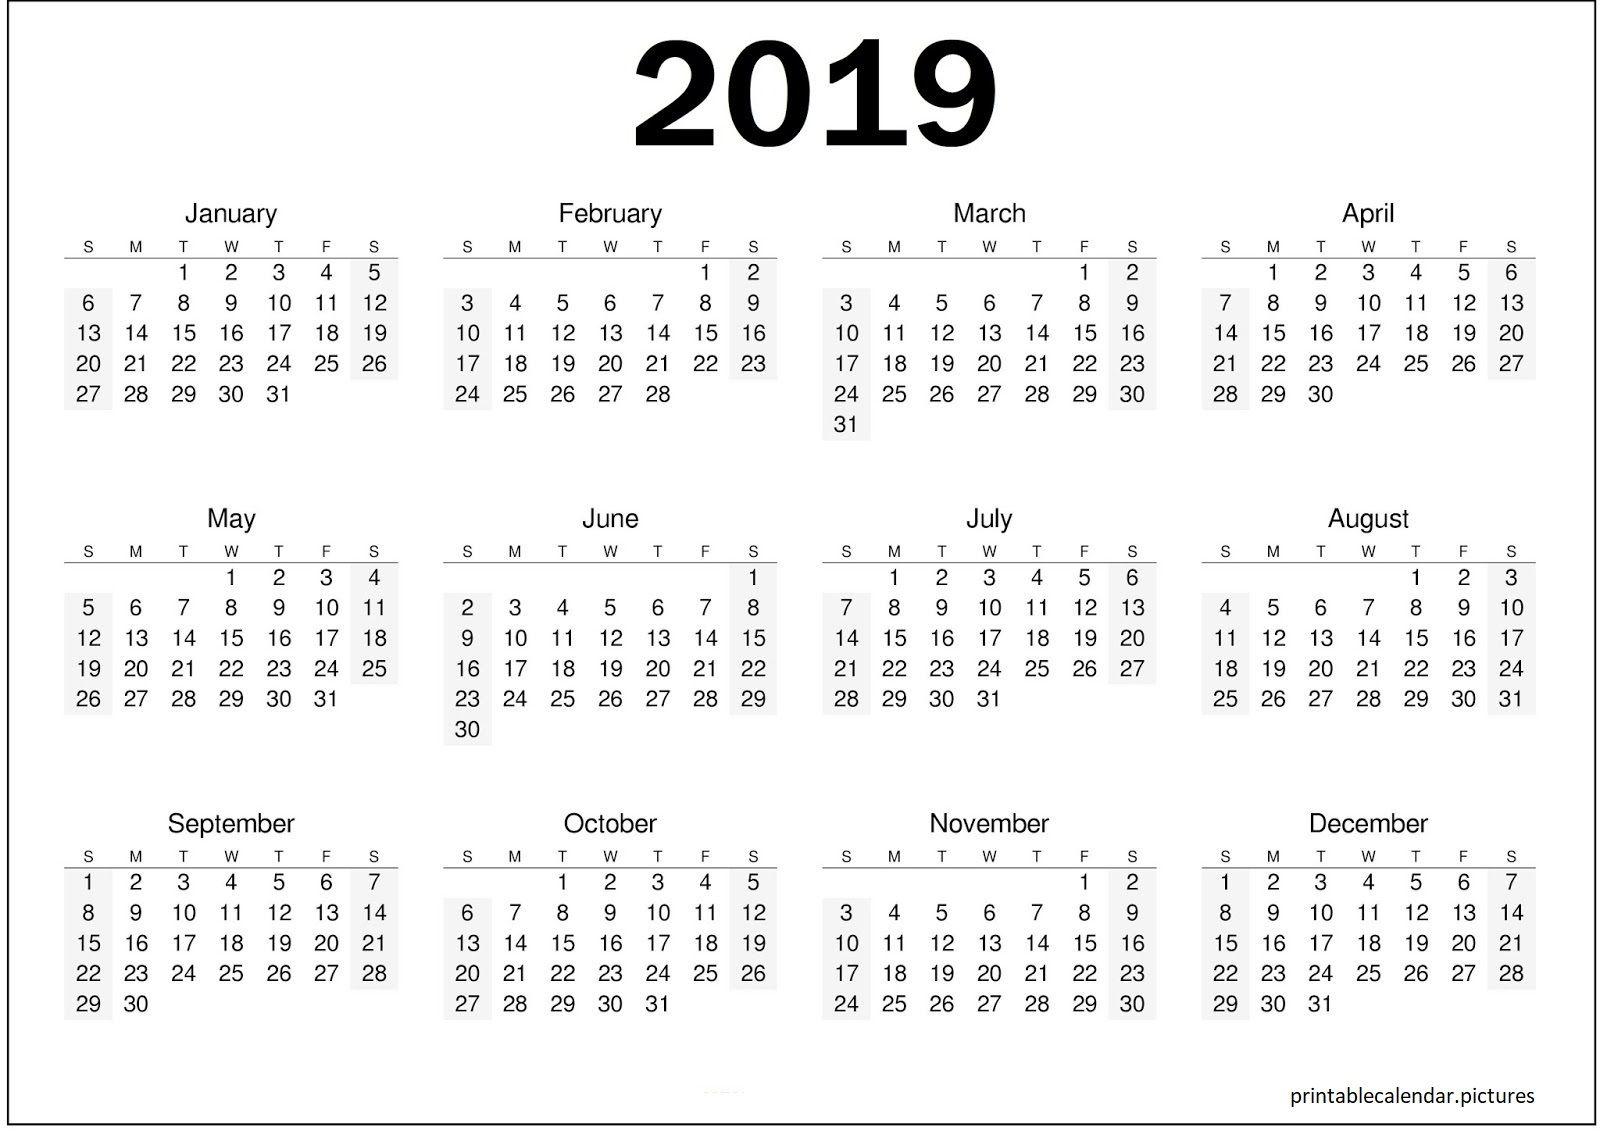 Printable Yearly Calendar 2019 Calendar 2019 template